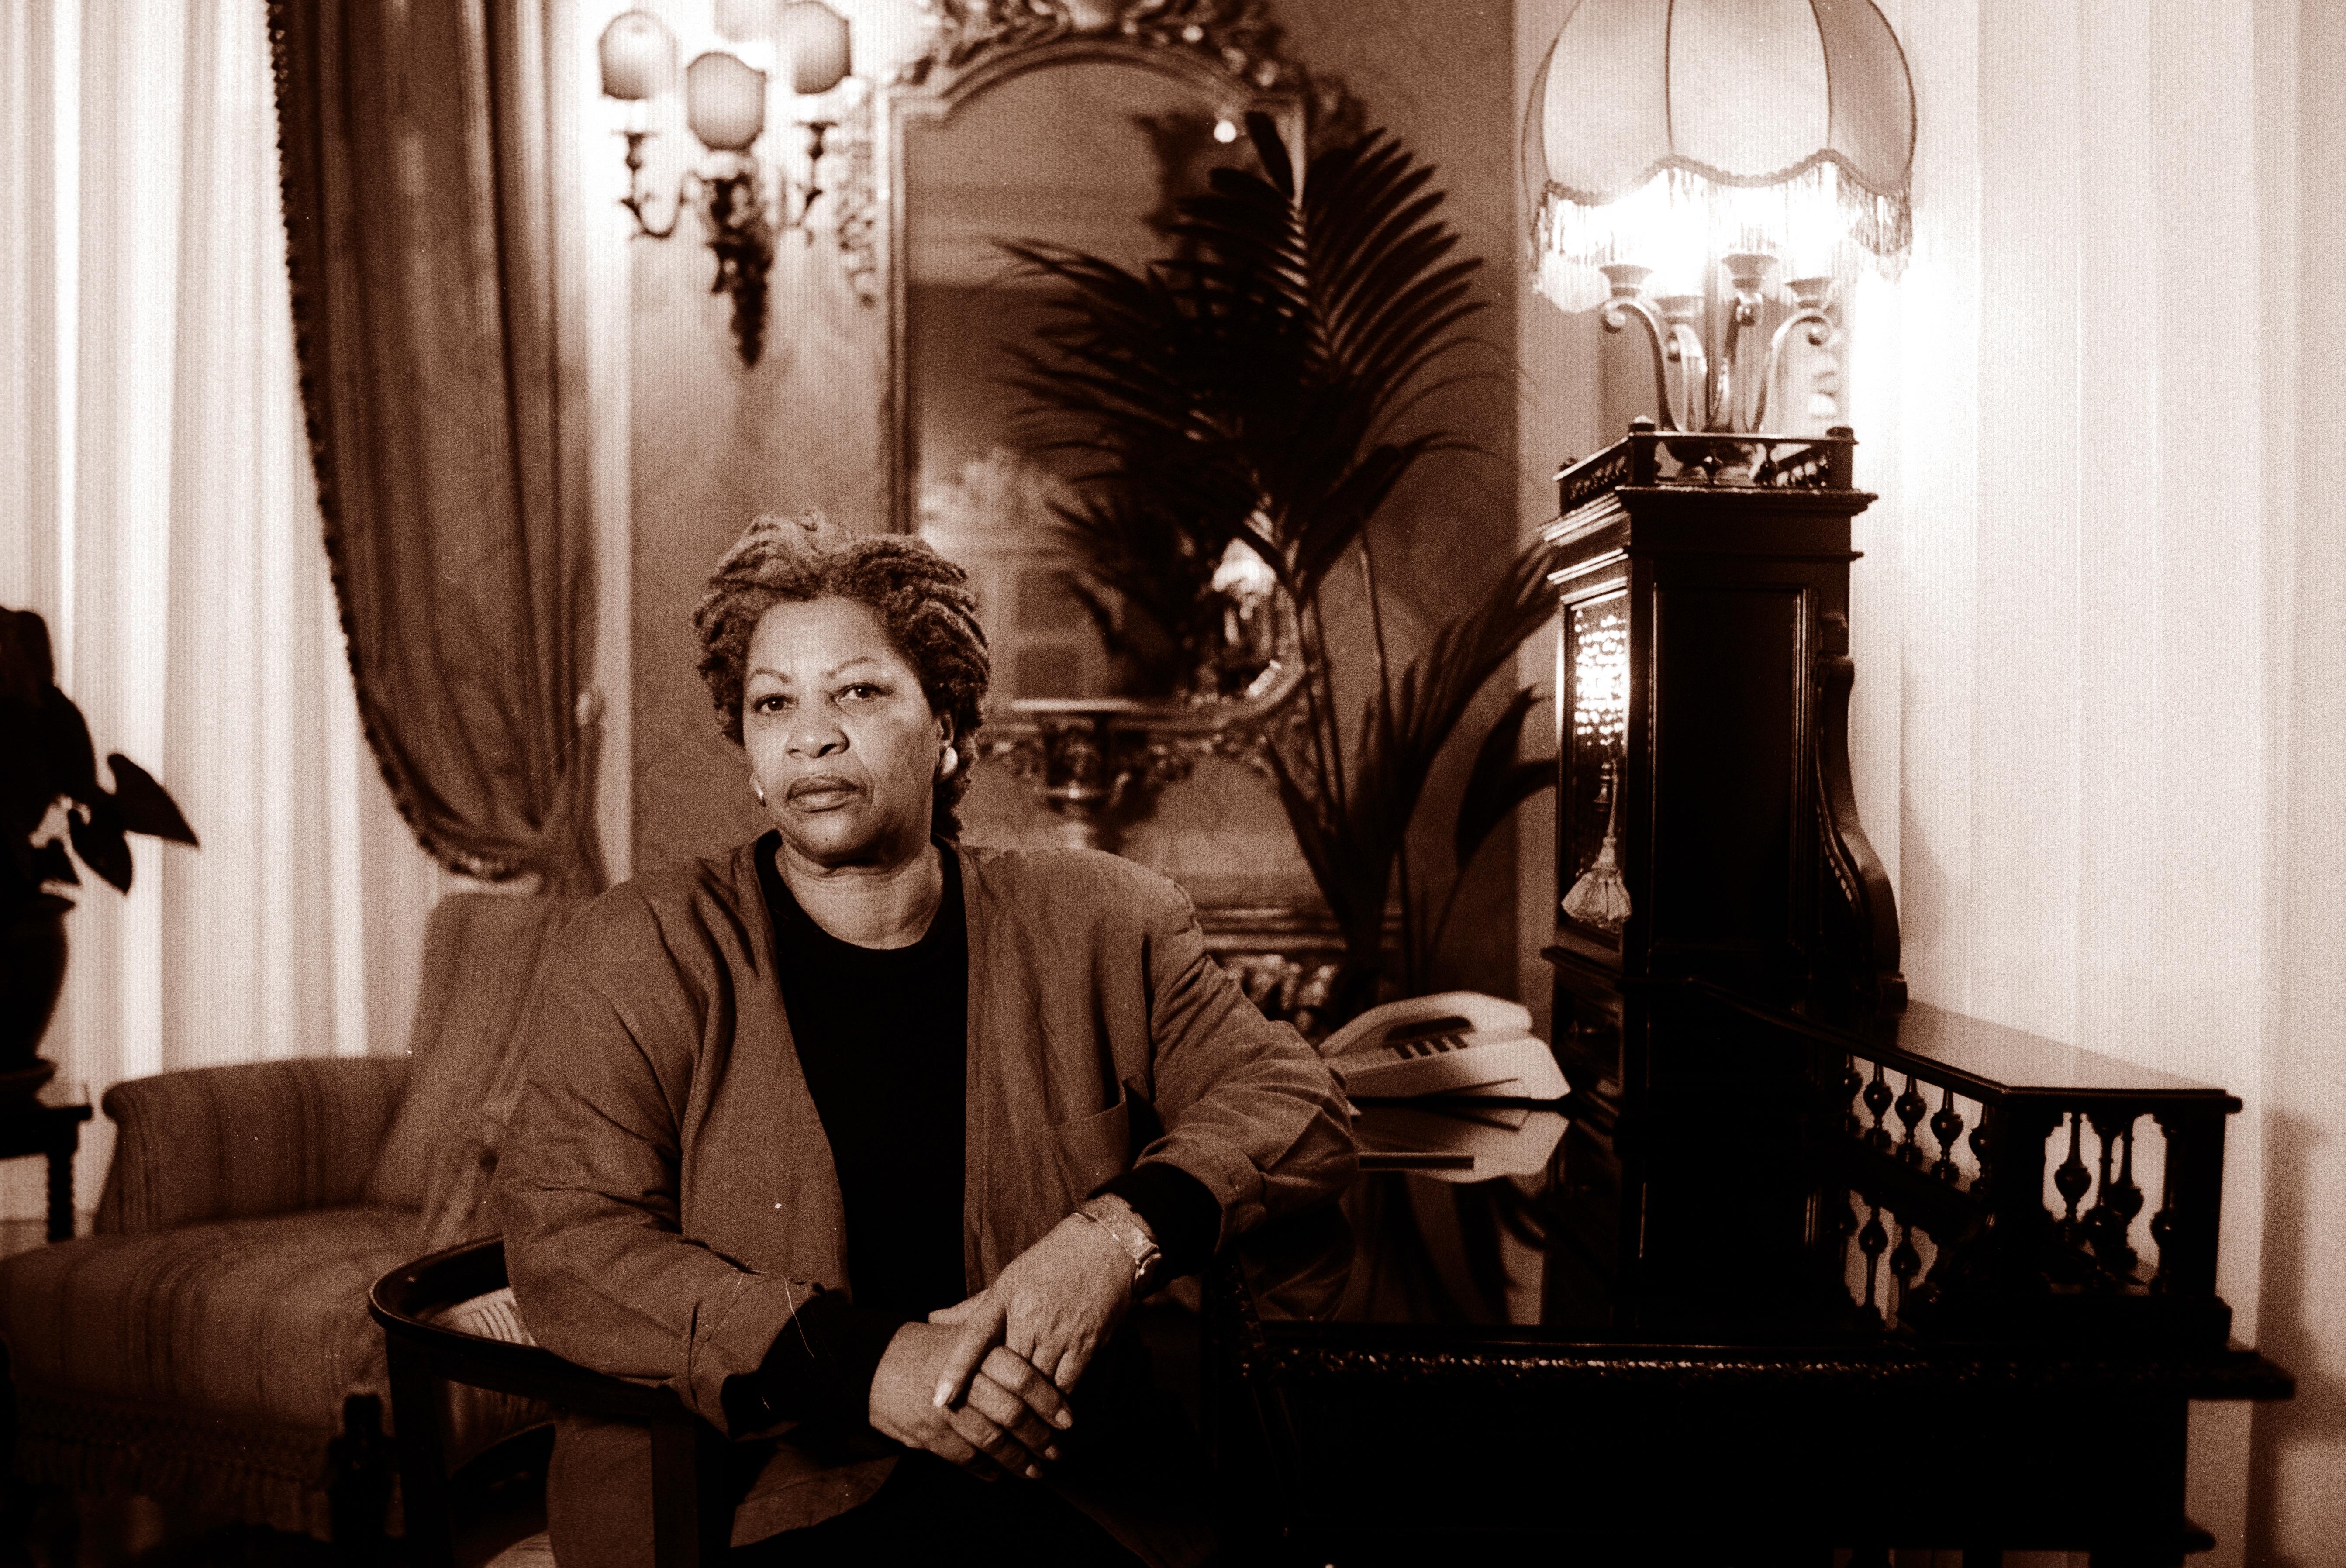 Toni Morrison's transcendent Nobel Prize speech is key to understanding what made Morrison so great